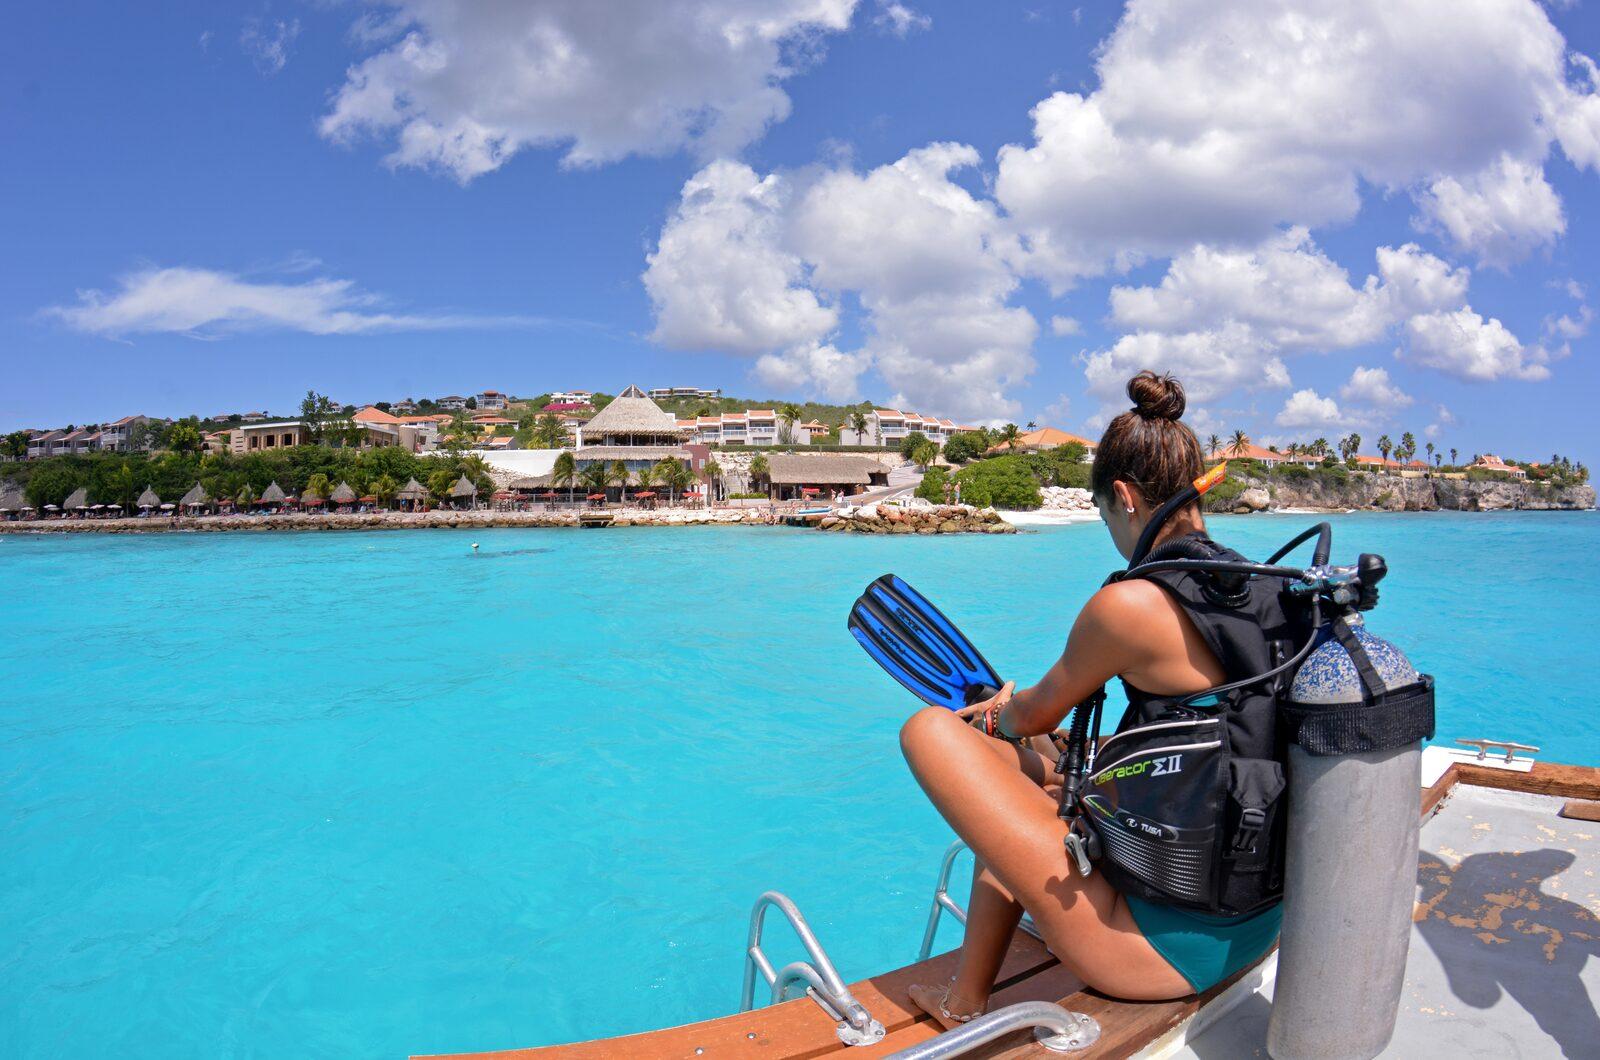 Snorkeling | travelstory